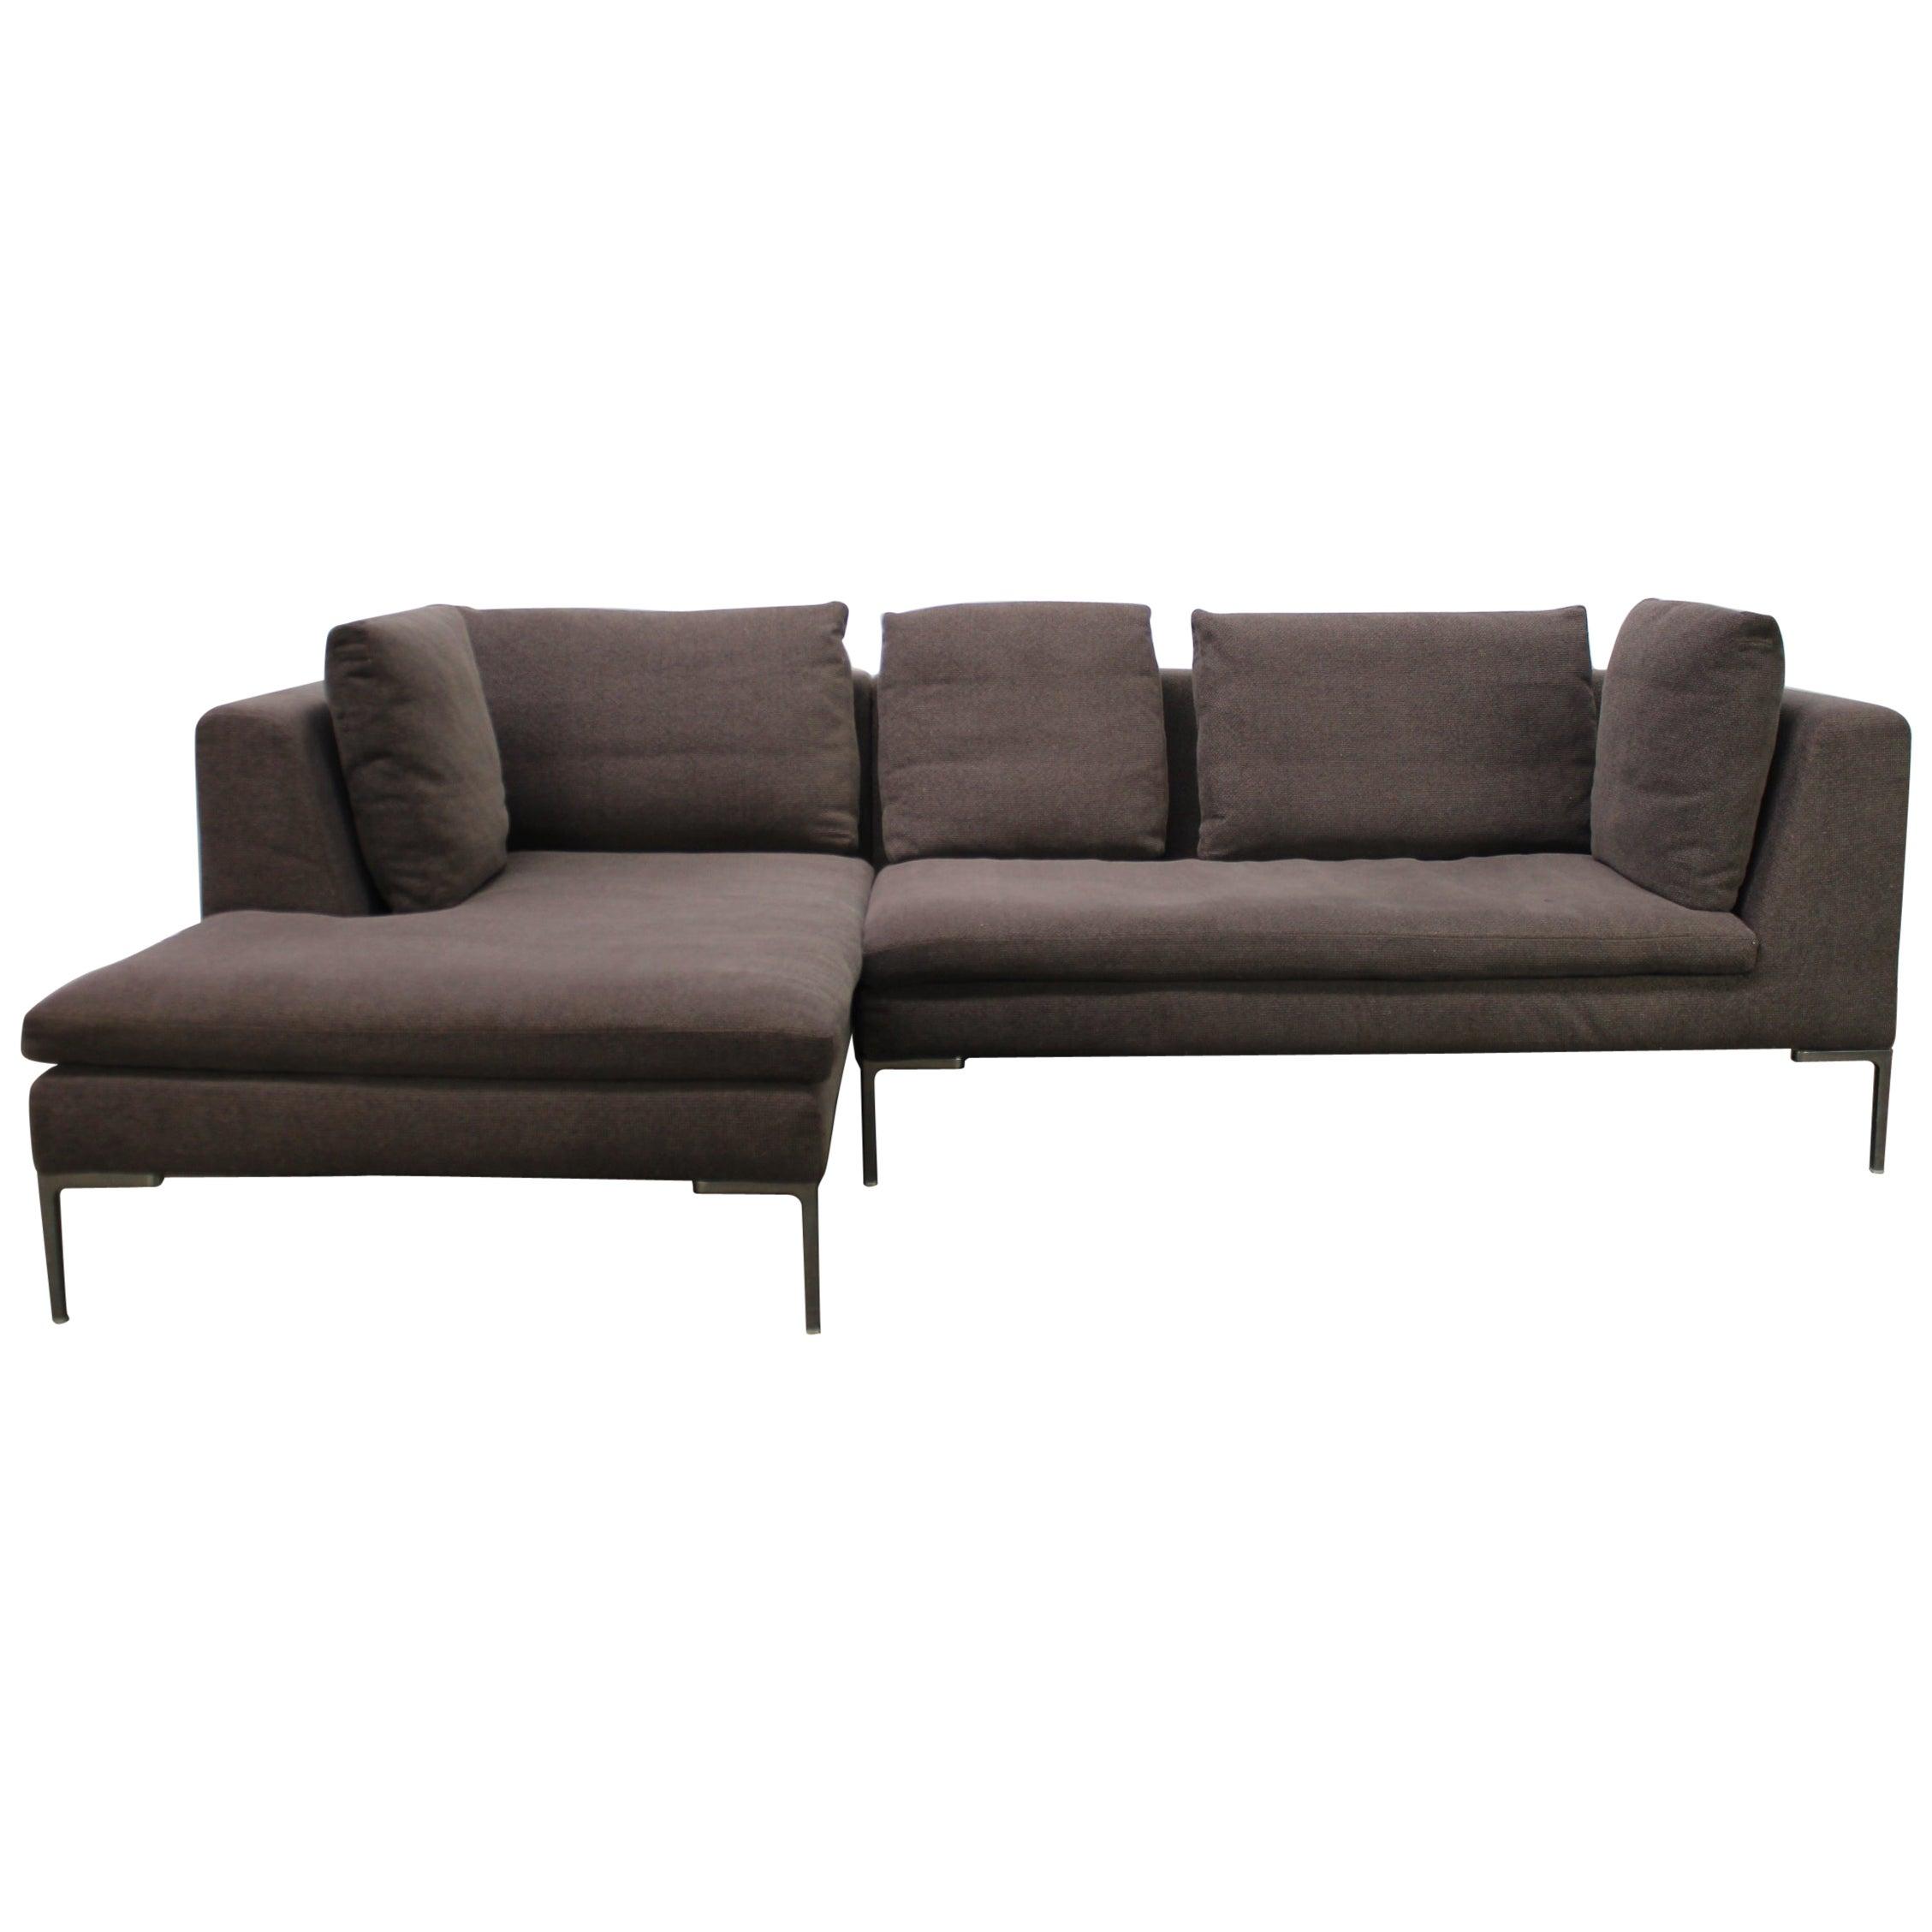 "B&B Italia ""Charles"" Compact L-Shape Sectional Sofa in Grey Basketweave  Fabric"